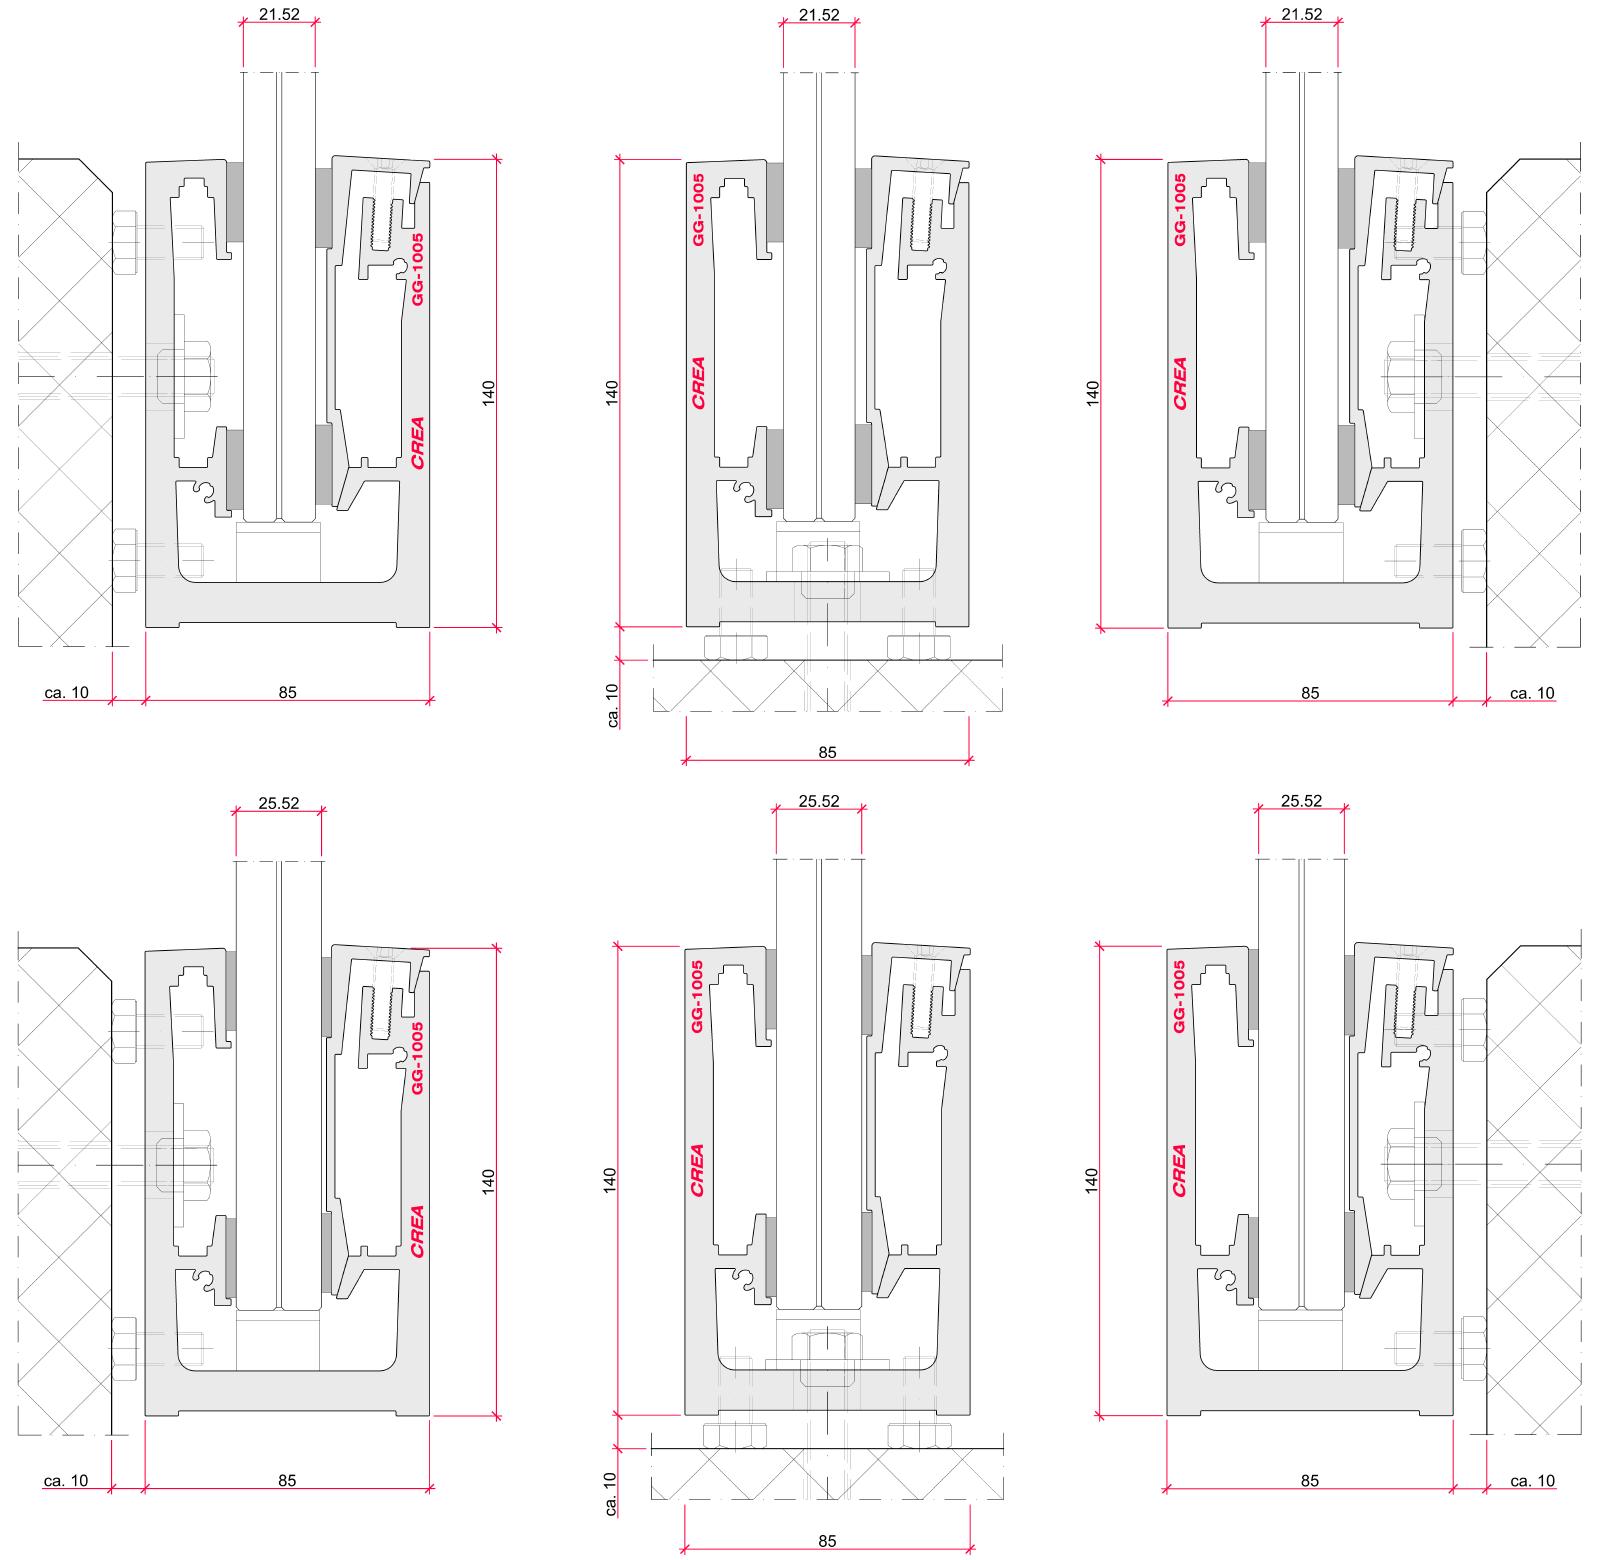 CREALINE GG-1005 installation options